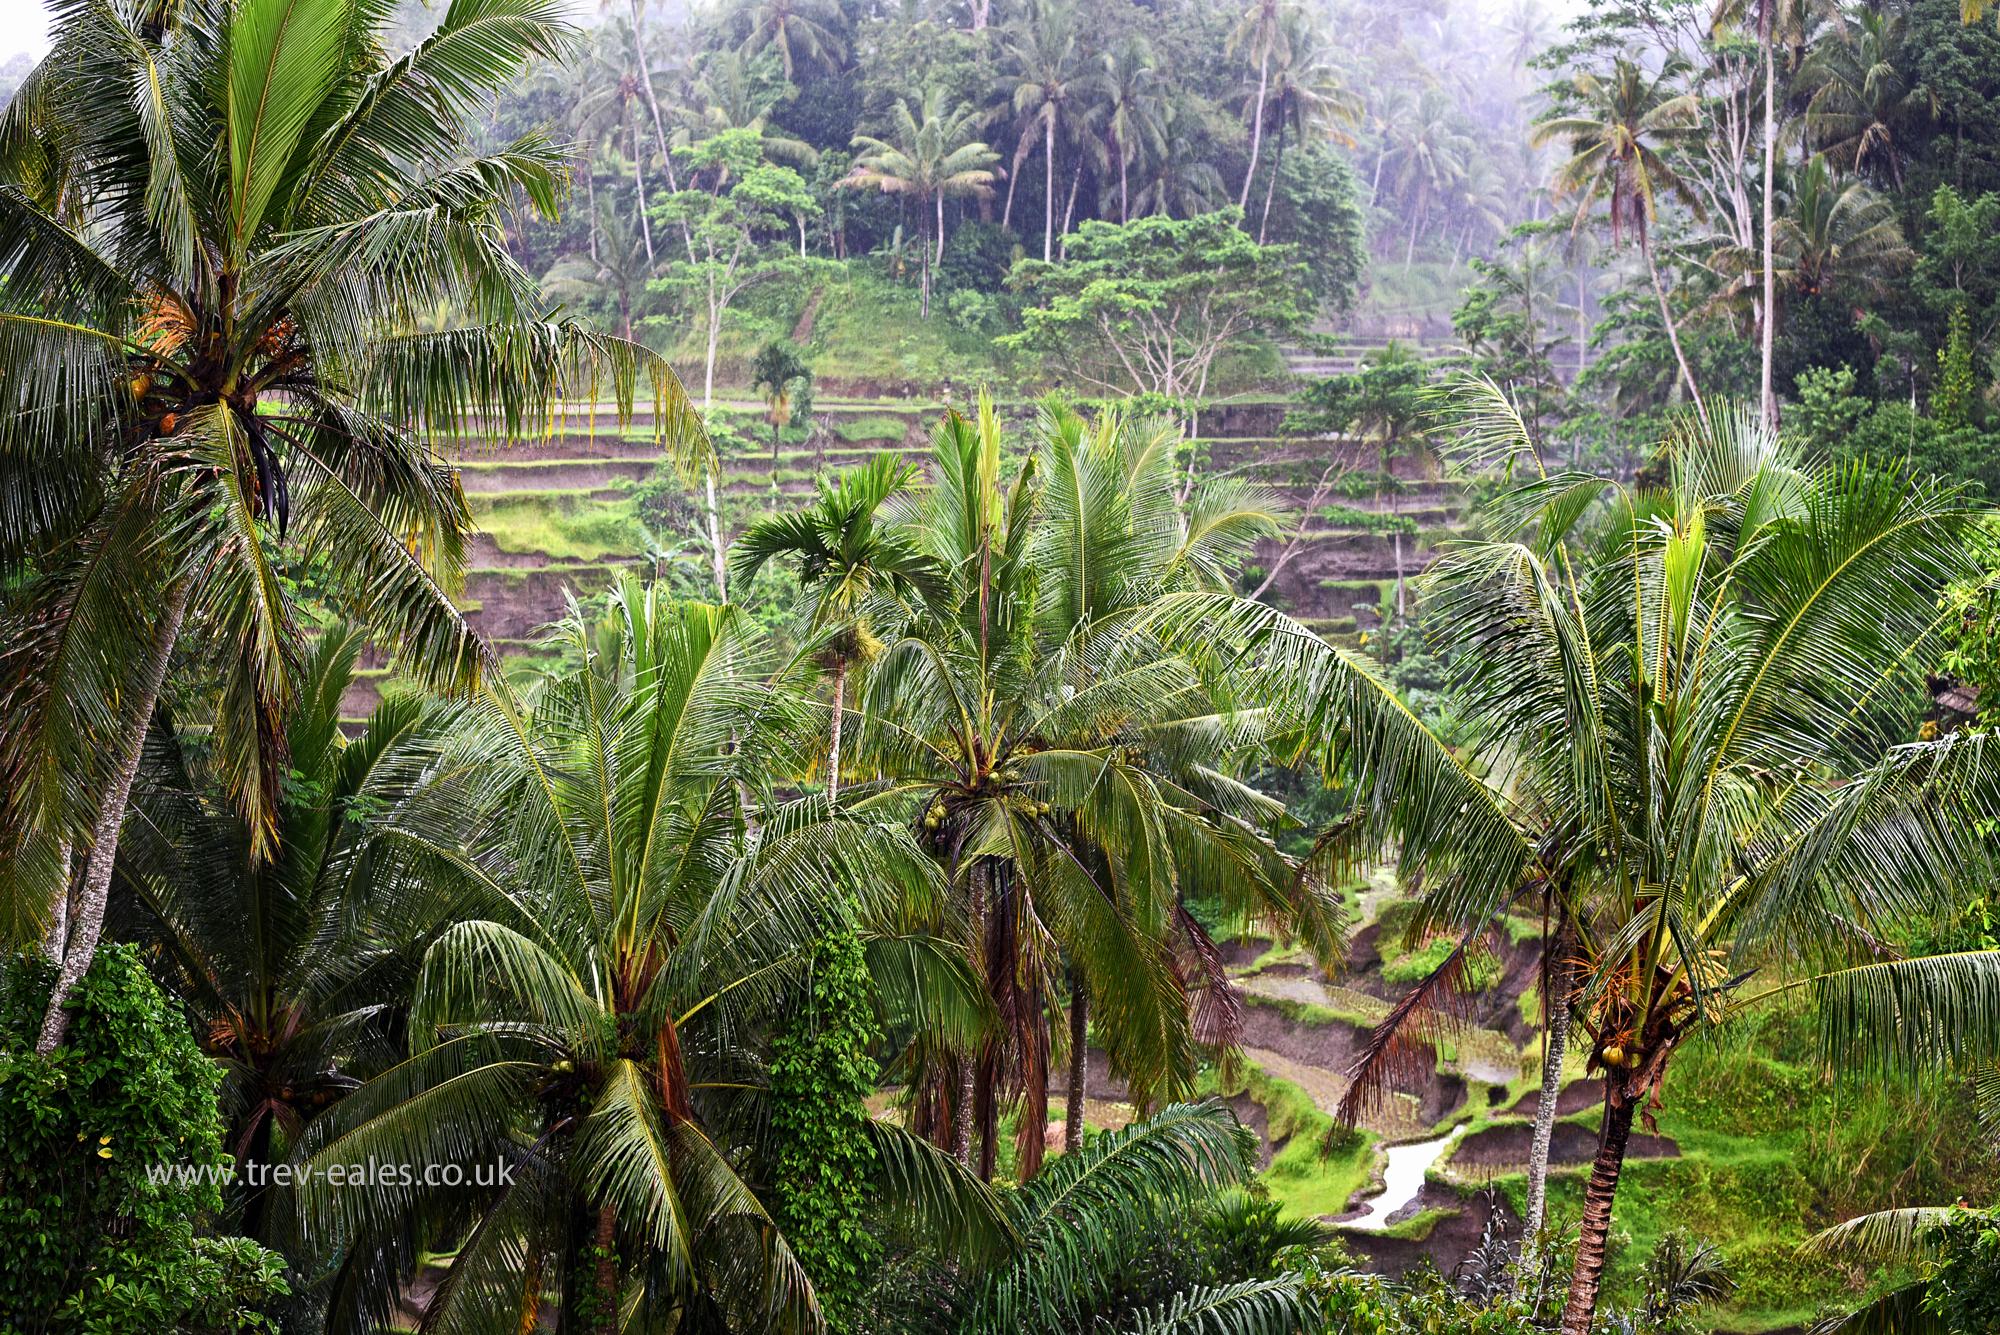 hintergrundbilder reisfelder riceterrace handfl chen kokusnuss palme kokosnuss banane. Black Bedroom Furniture Sets. Home Design Ideas